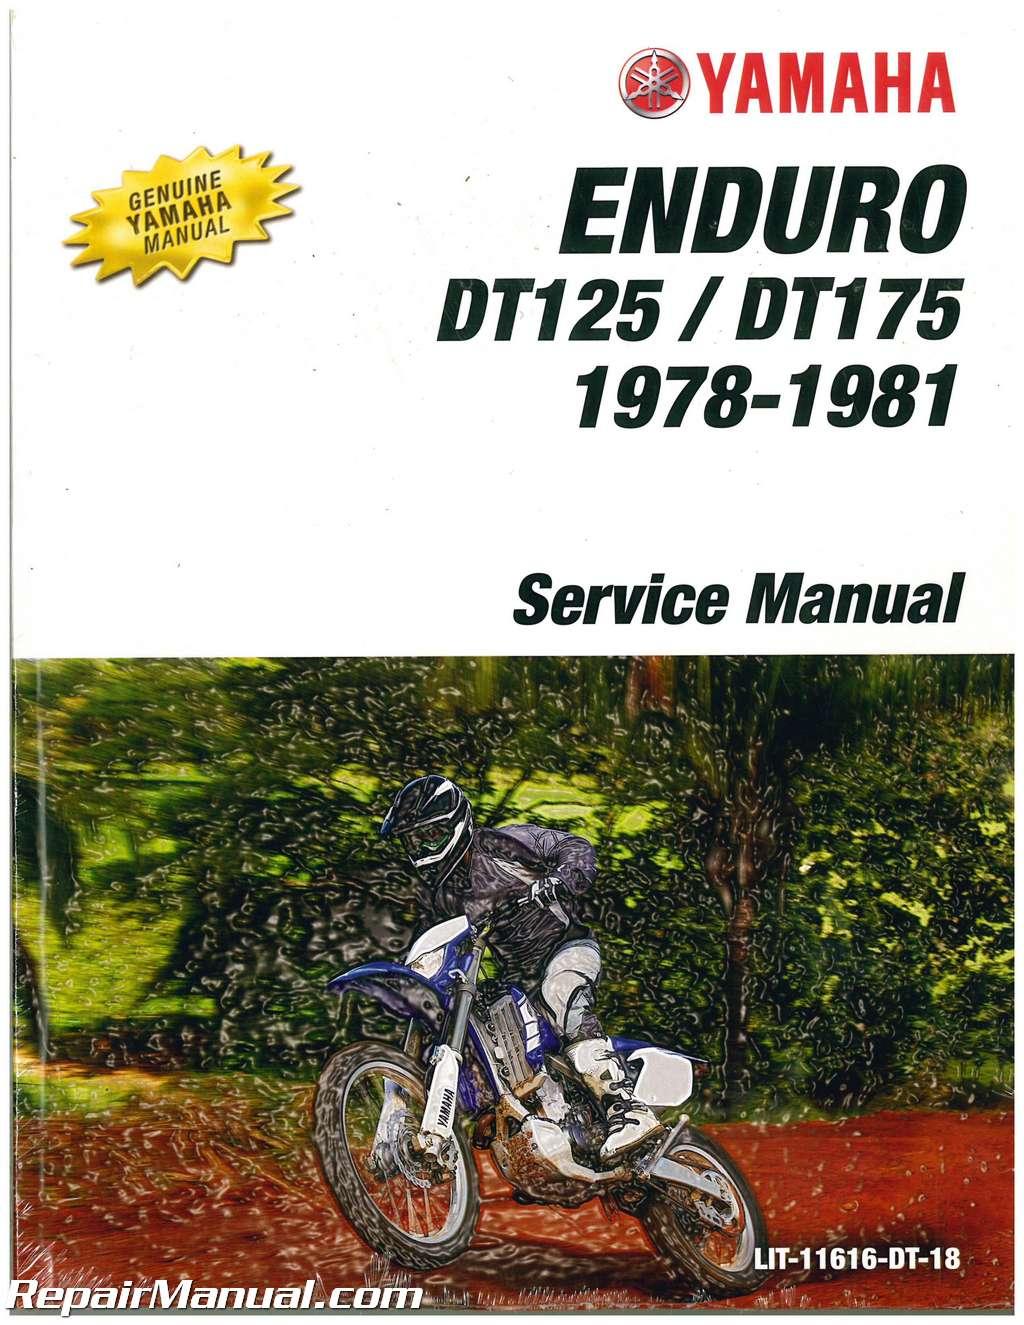 Dt 175 Service Manual